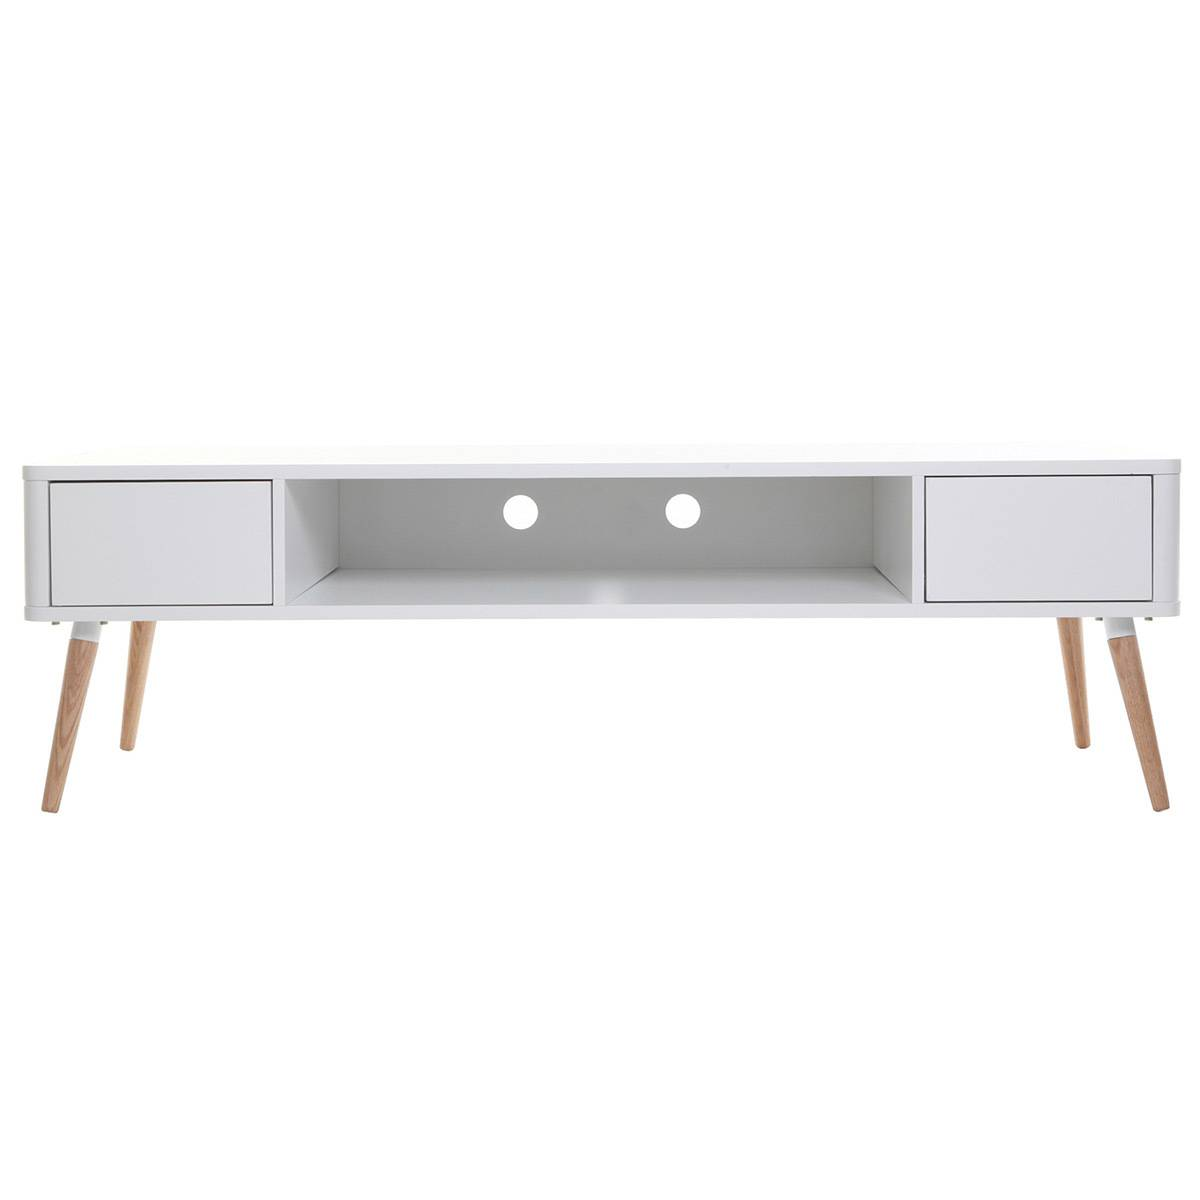 Miliboo Meuble TV design scandinave TOTEM